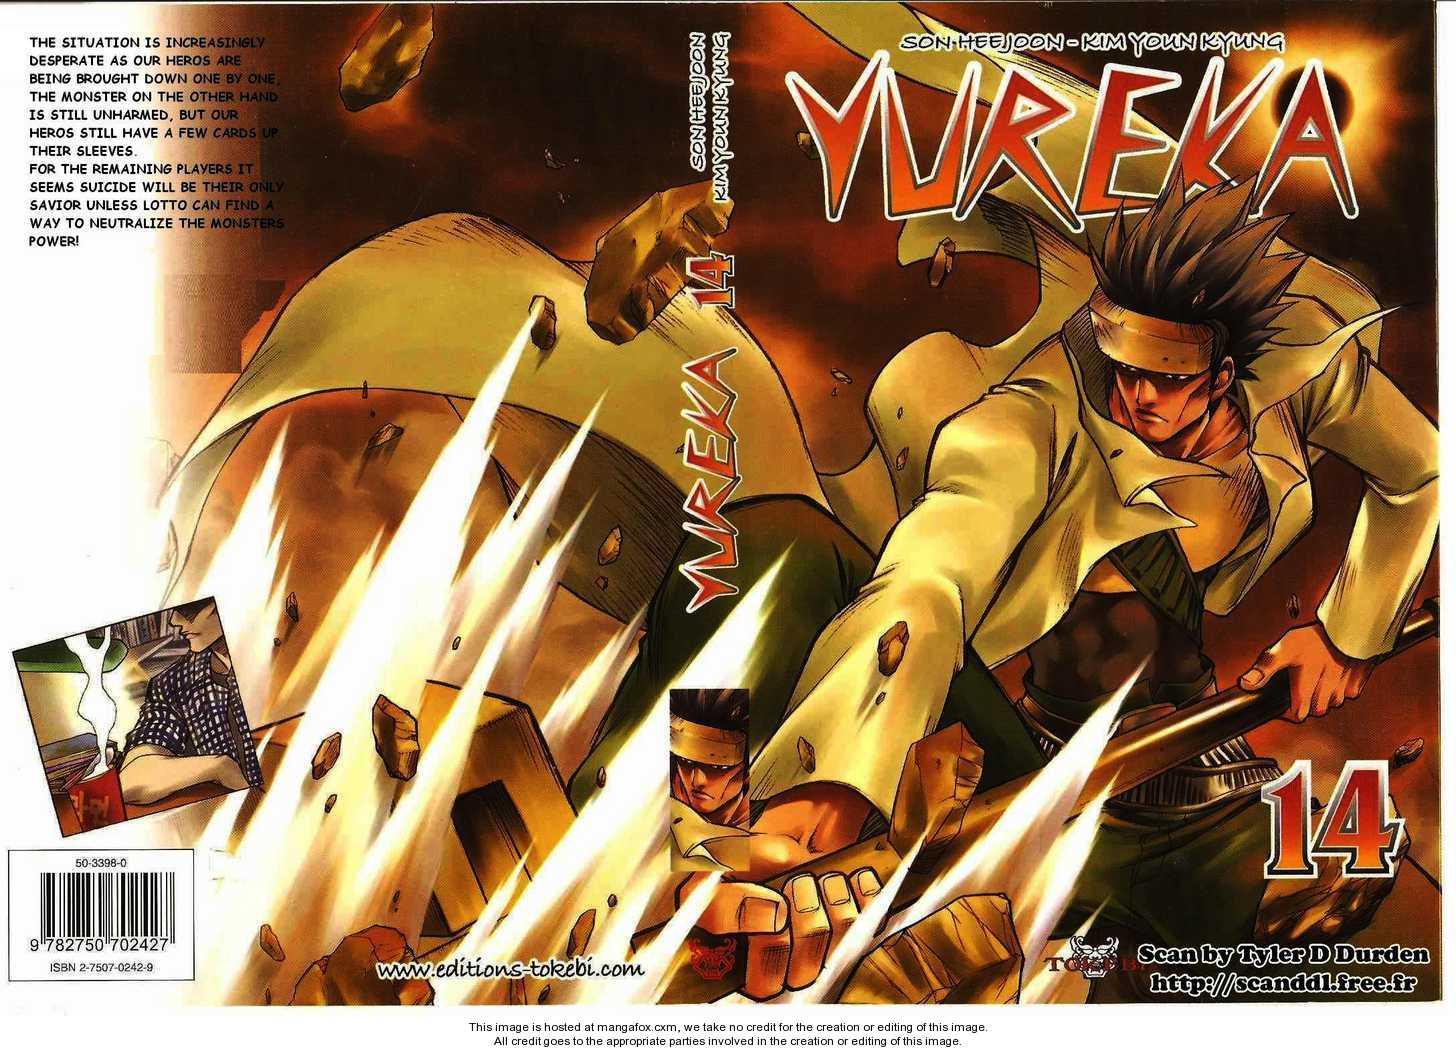 Yureka 82 Page 1